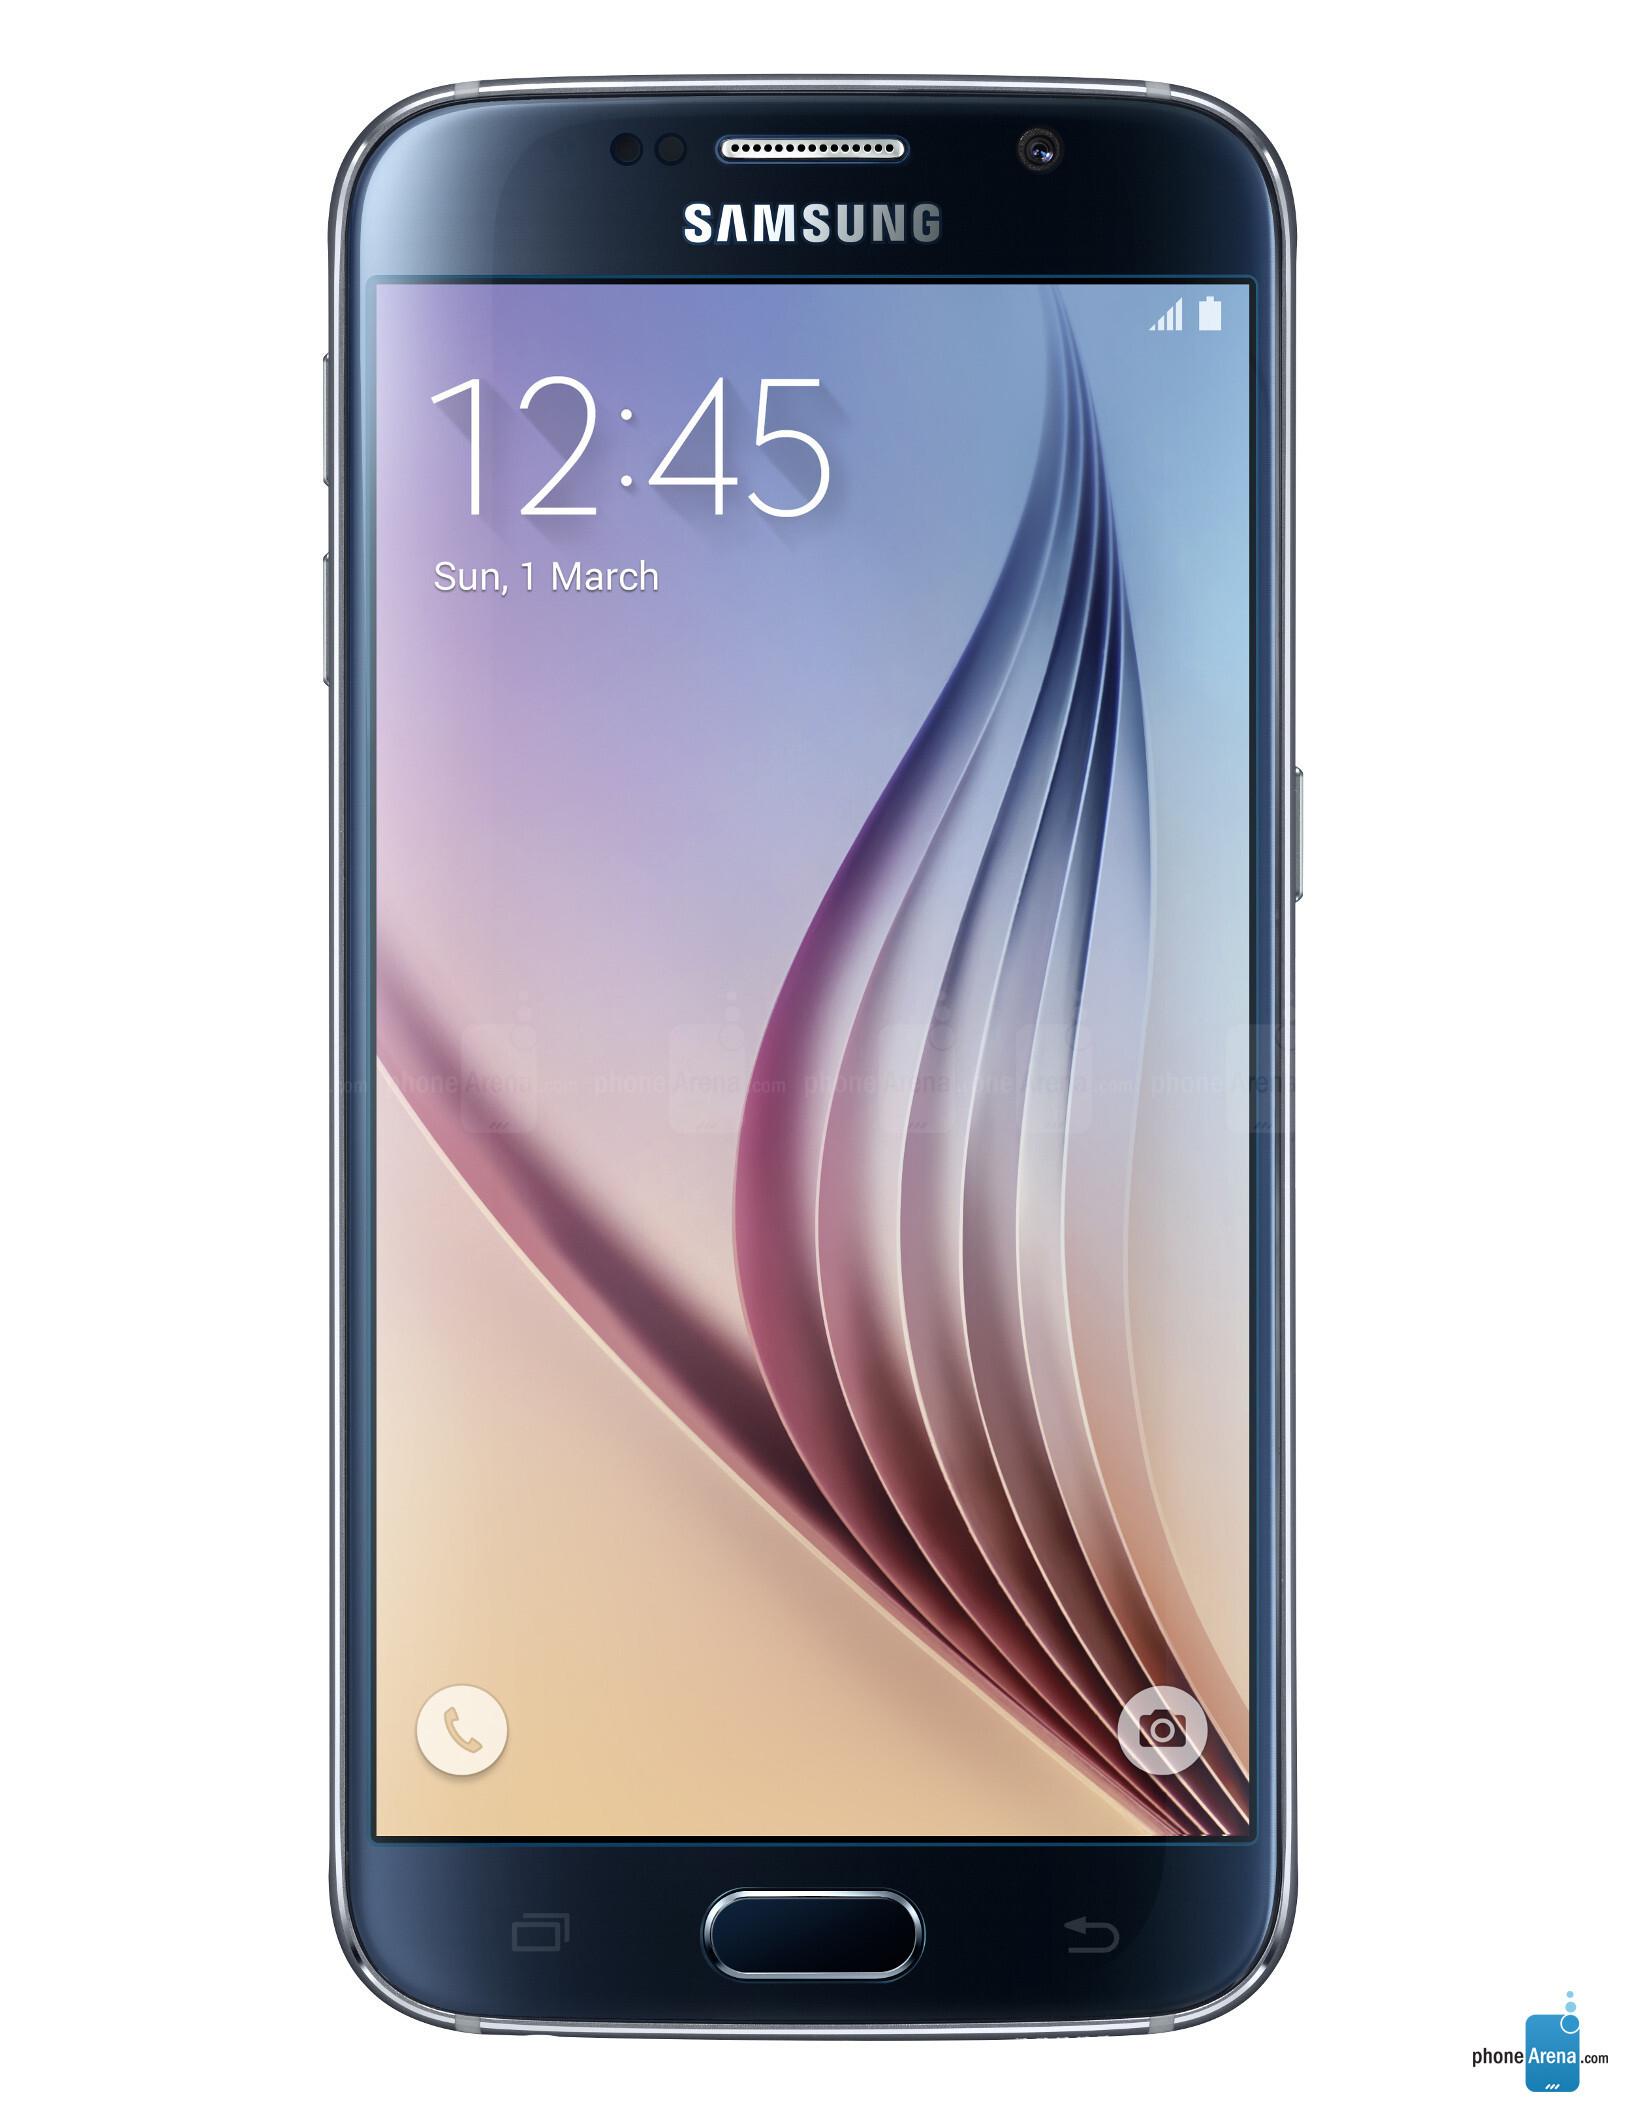 Samsung galaxy s6 photos stopboris Image collections